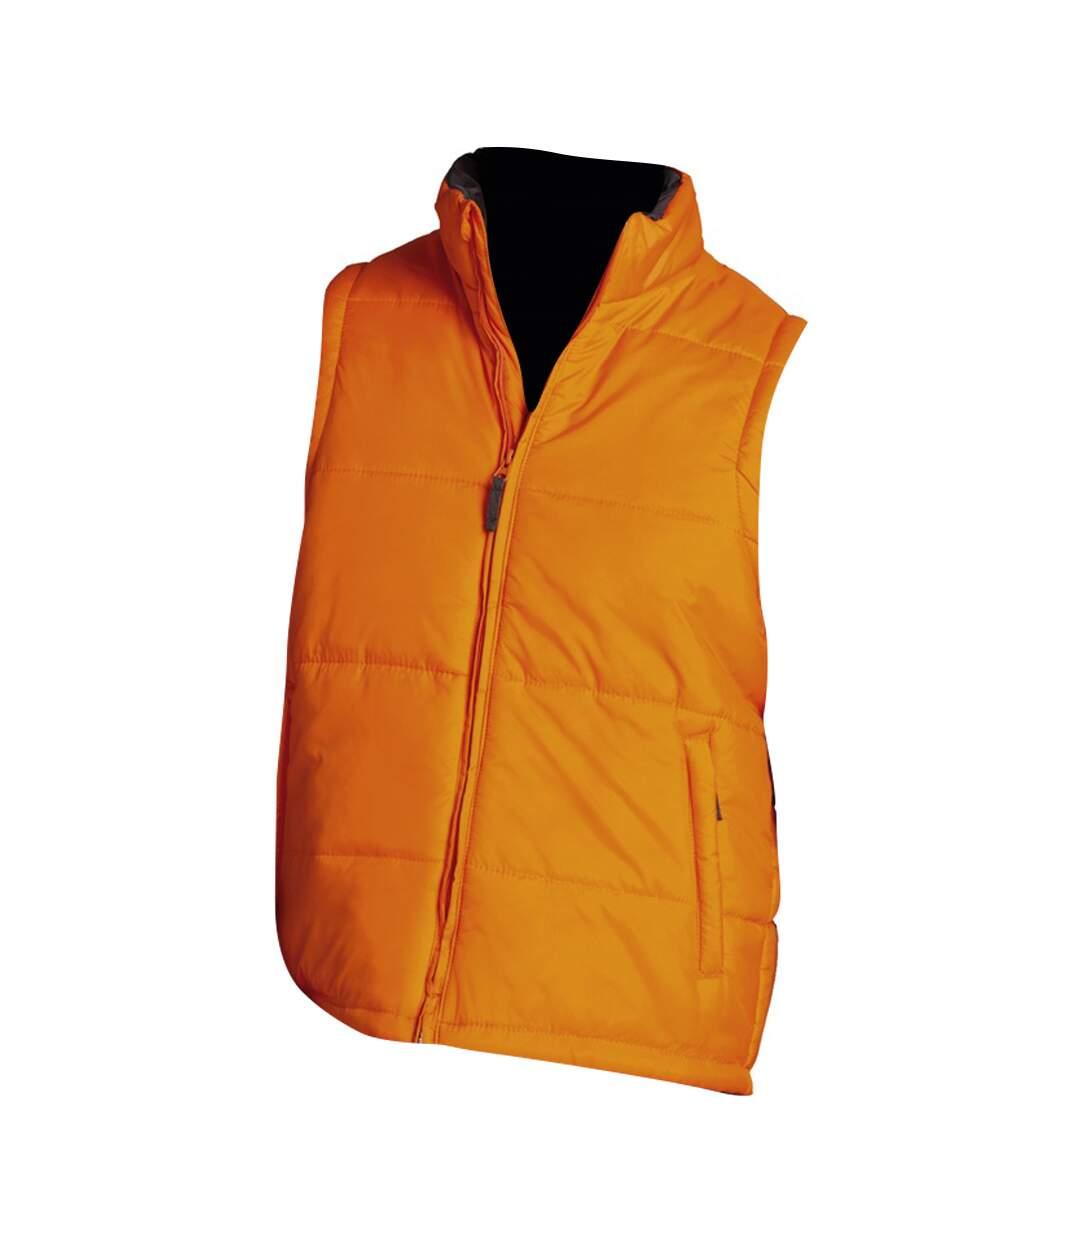 SOLS Warm Unisex Padded Bodywarmer Jacket (Orange) - UTPC355